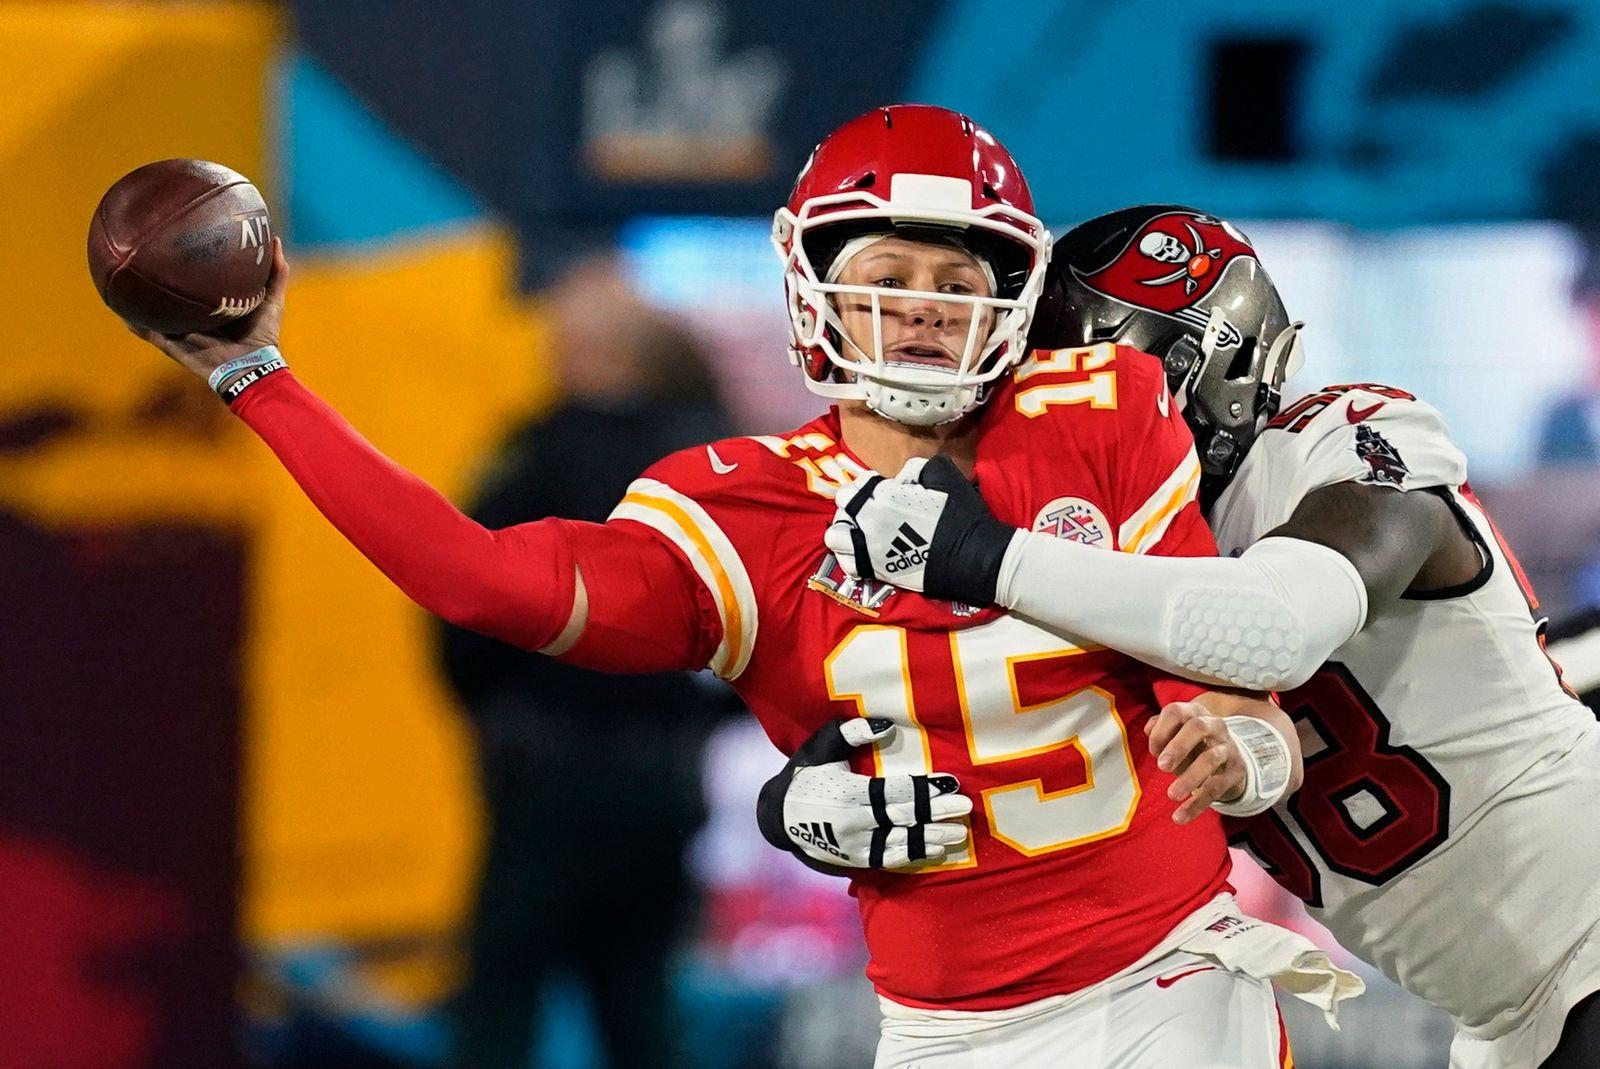 APTOPIX Chiefs Buccaneers Super Bowl Football